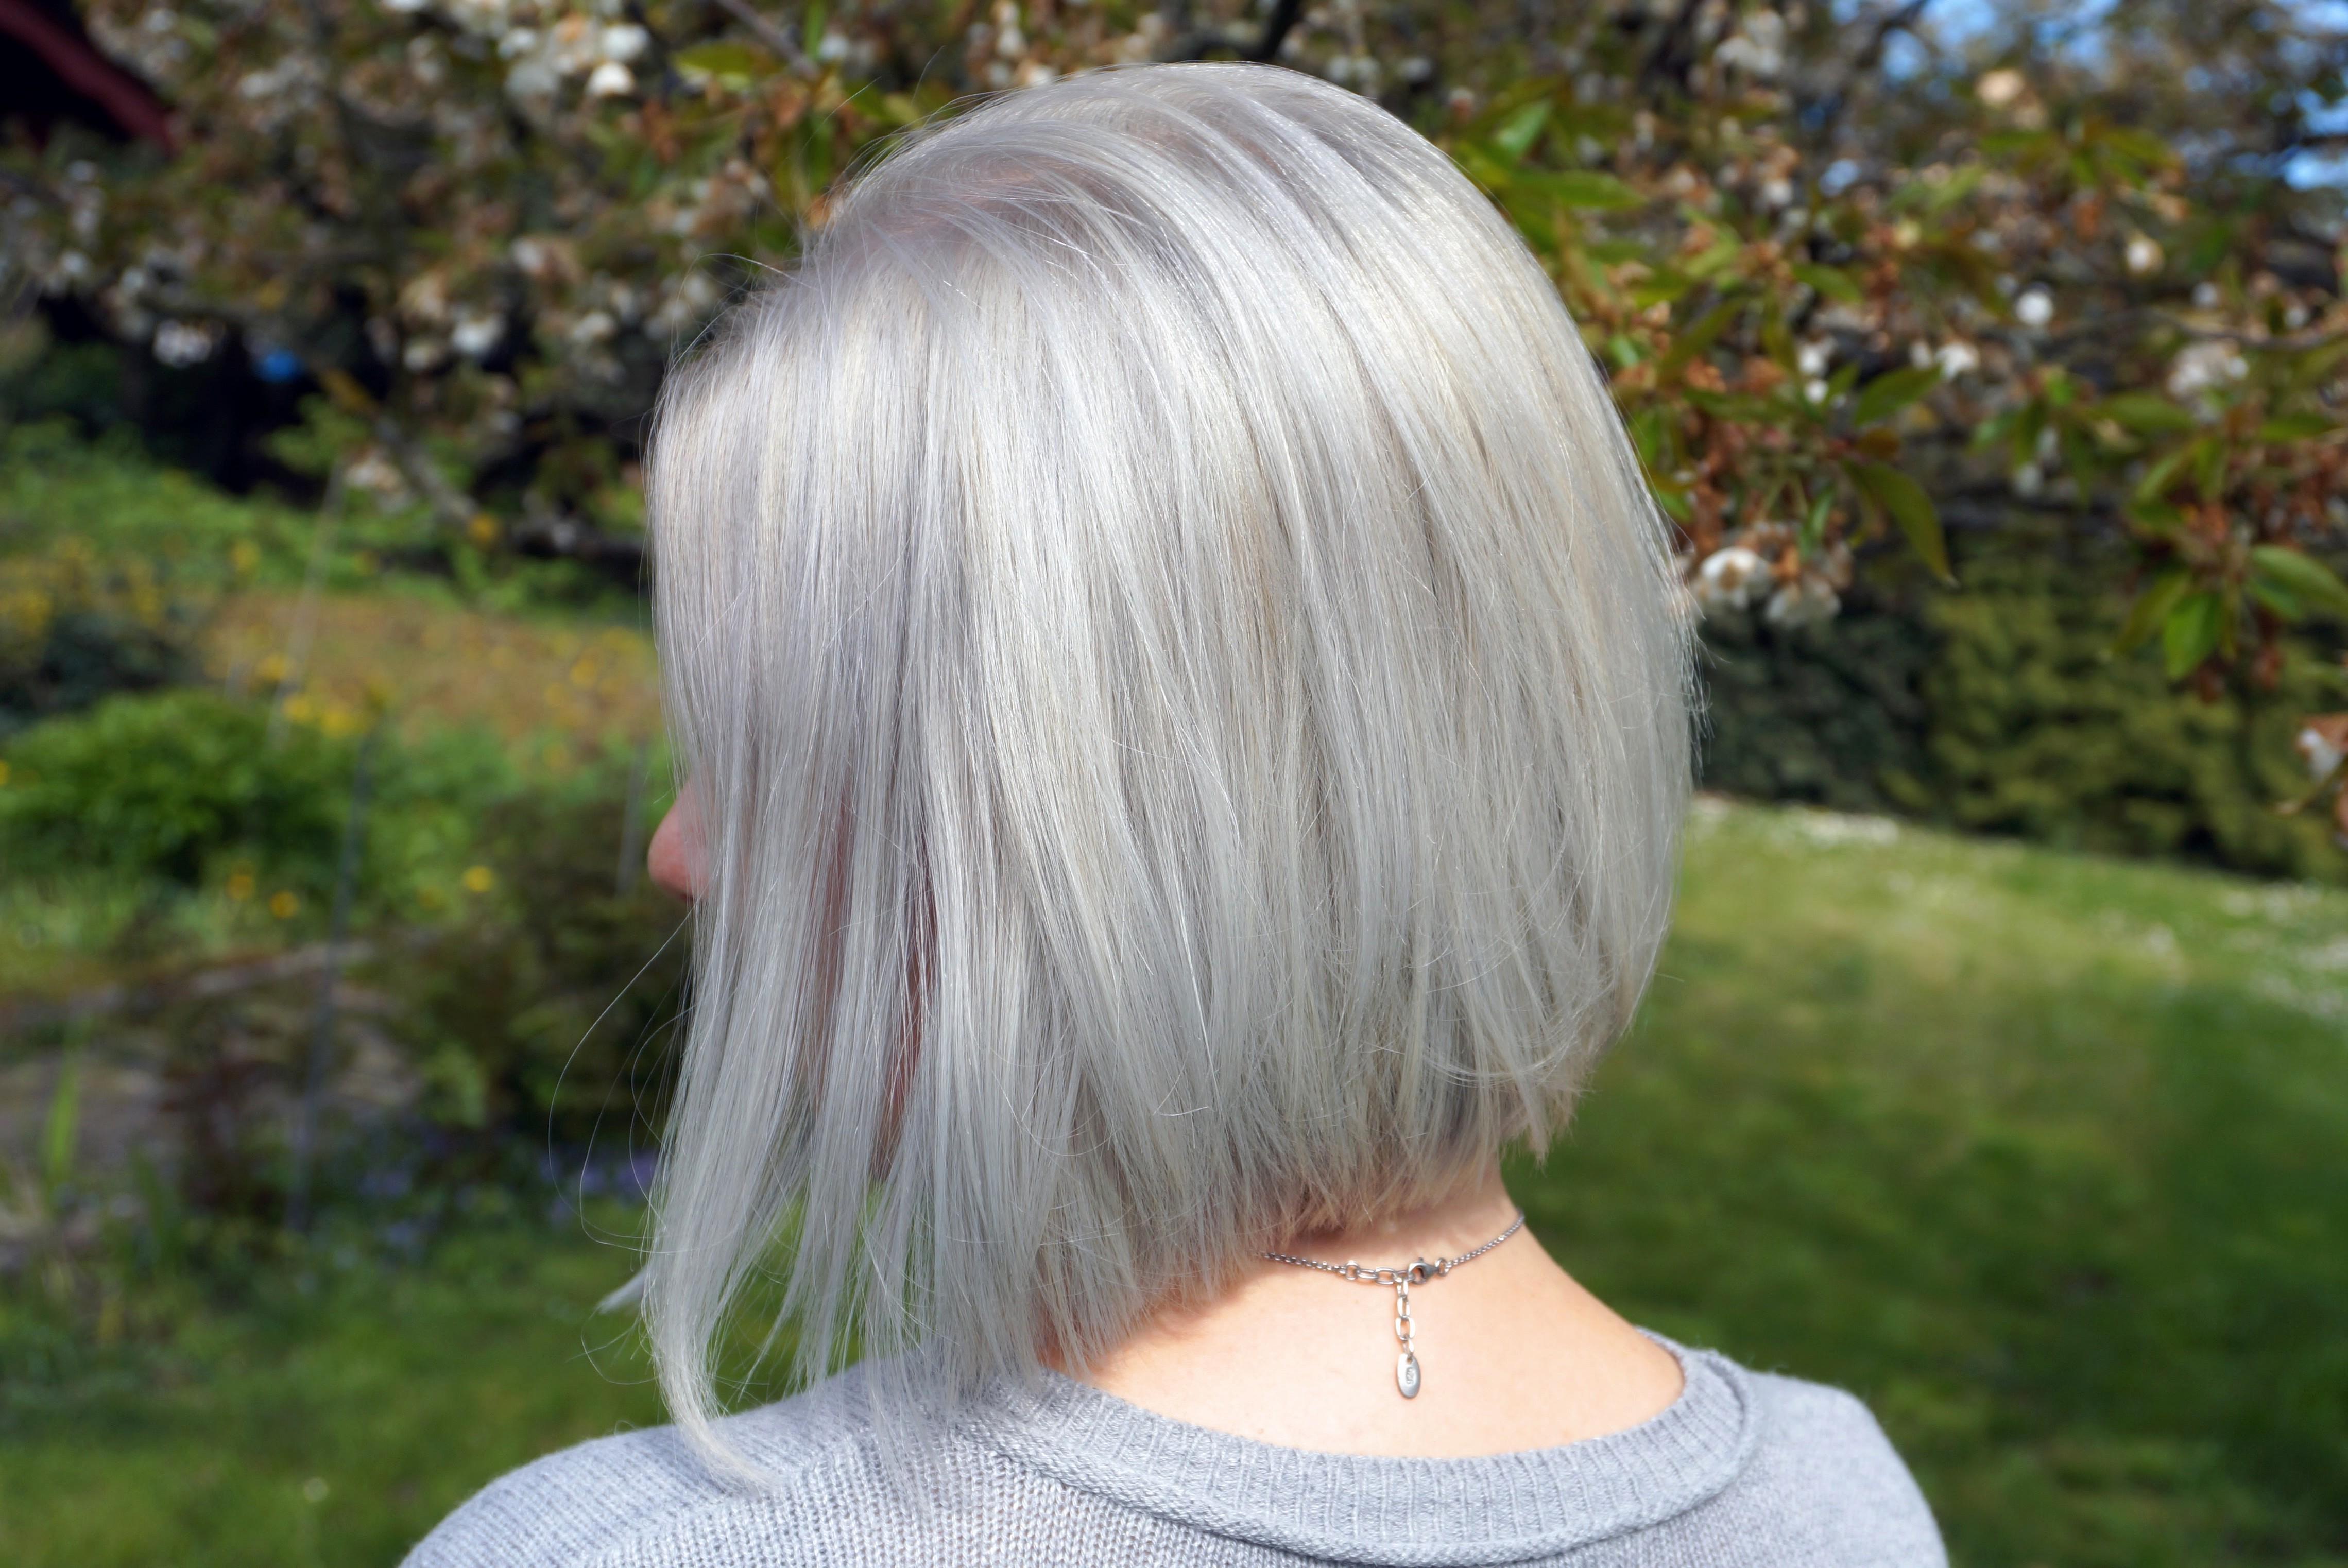 Graue Haare. Silberblond. - zuckerblond.de